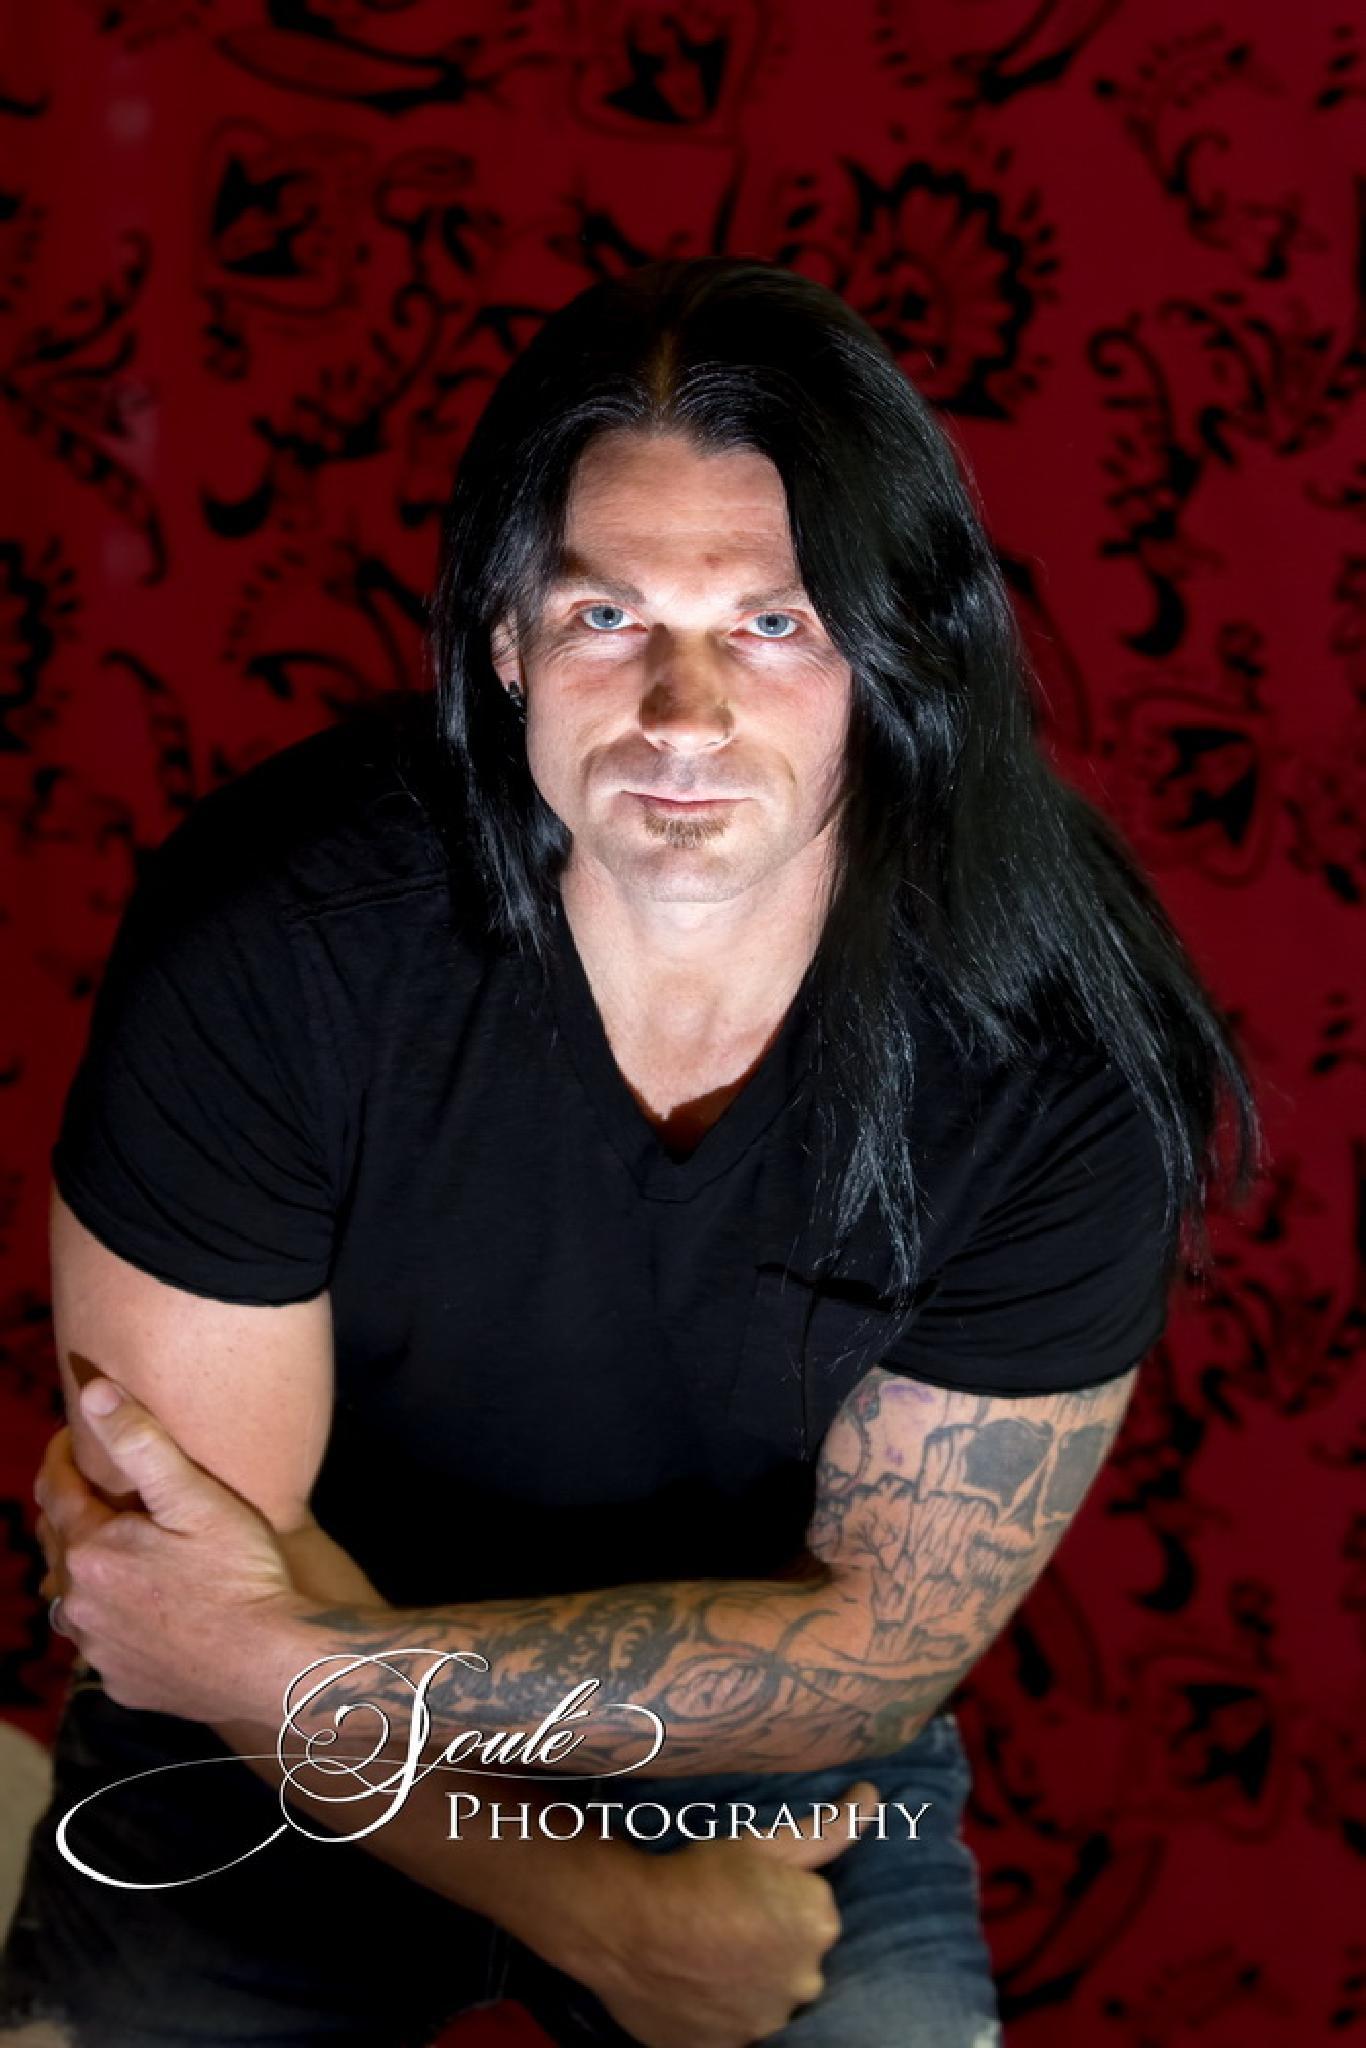 Rock Star in Waiting by Brent Soule